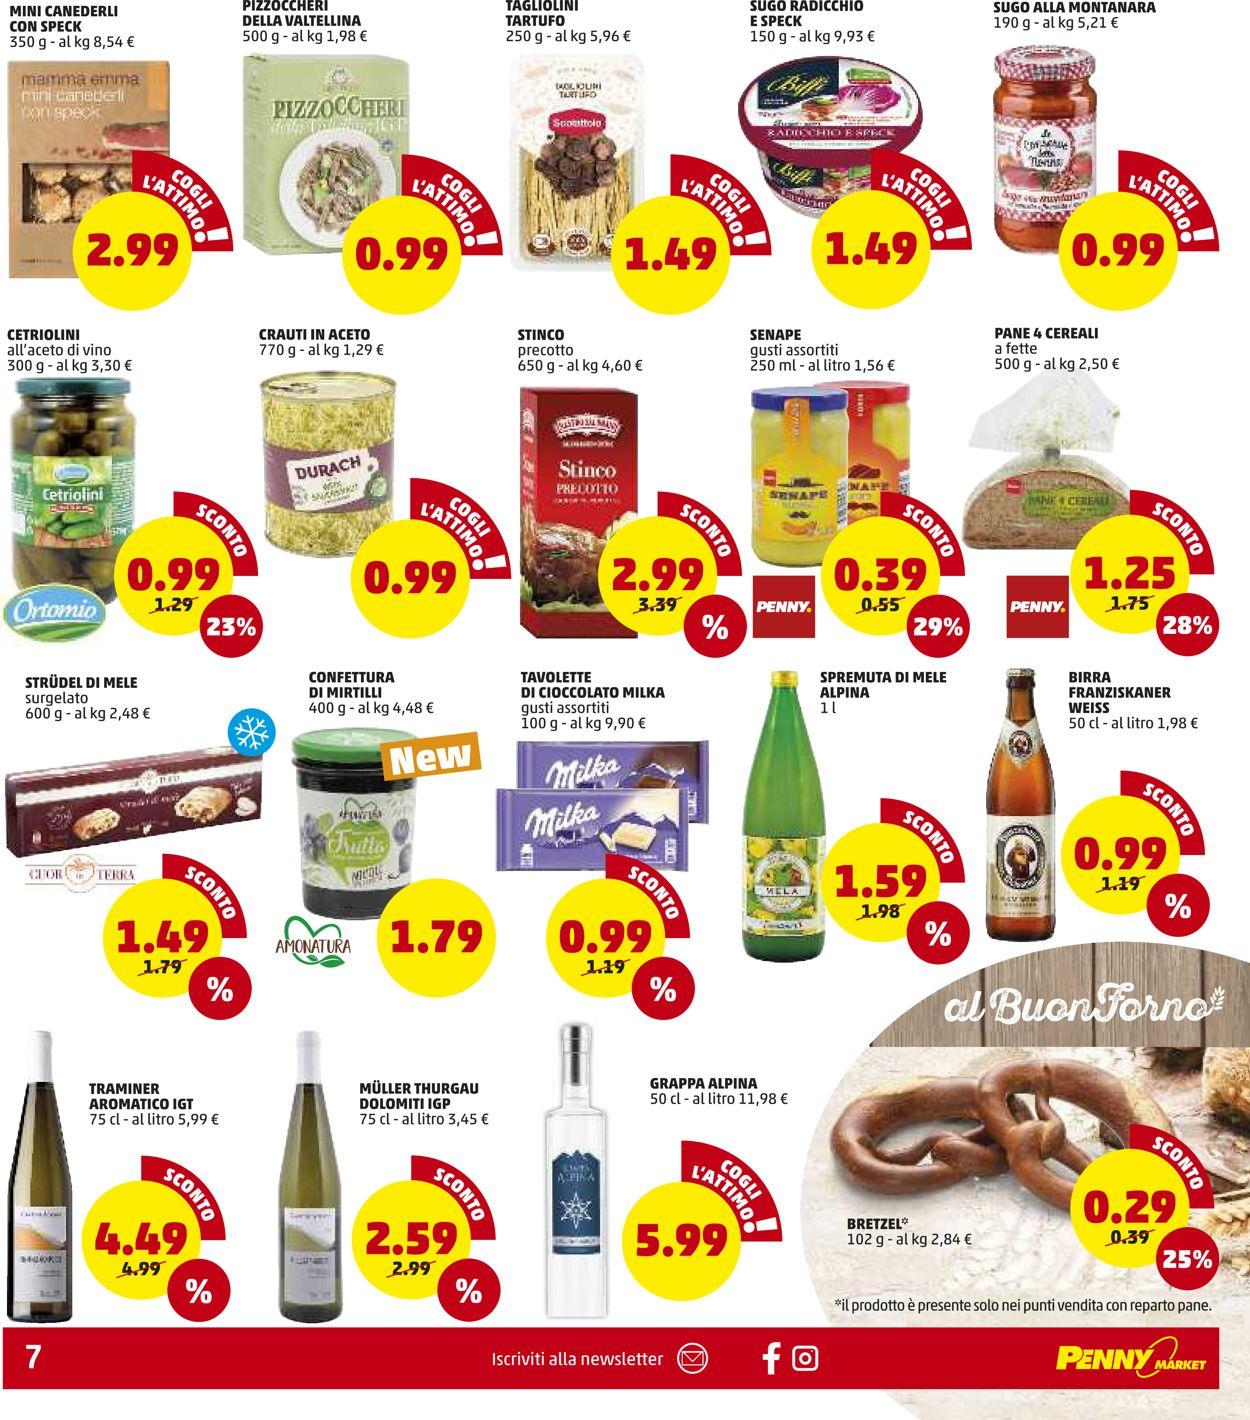 Volantino Penny Market - Offerte 11/02-17/02/2021 (Pagina 7)